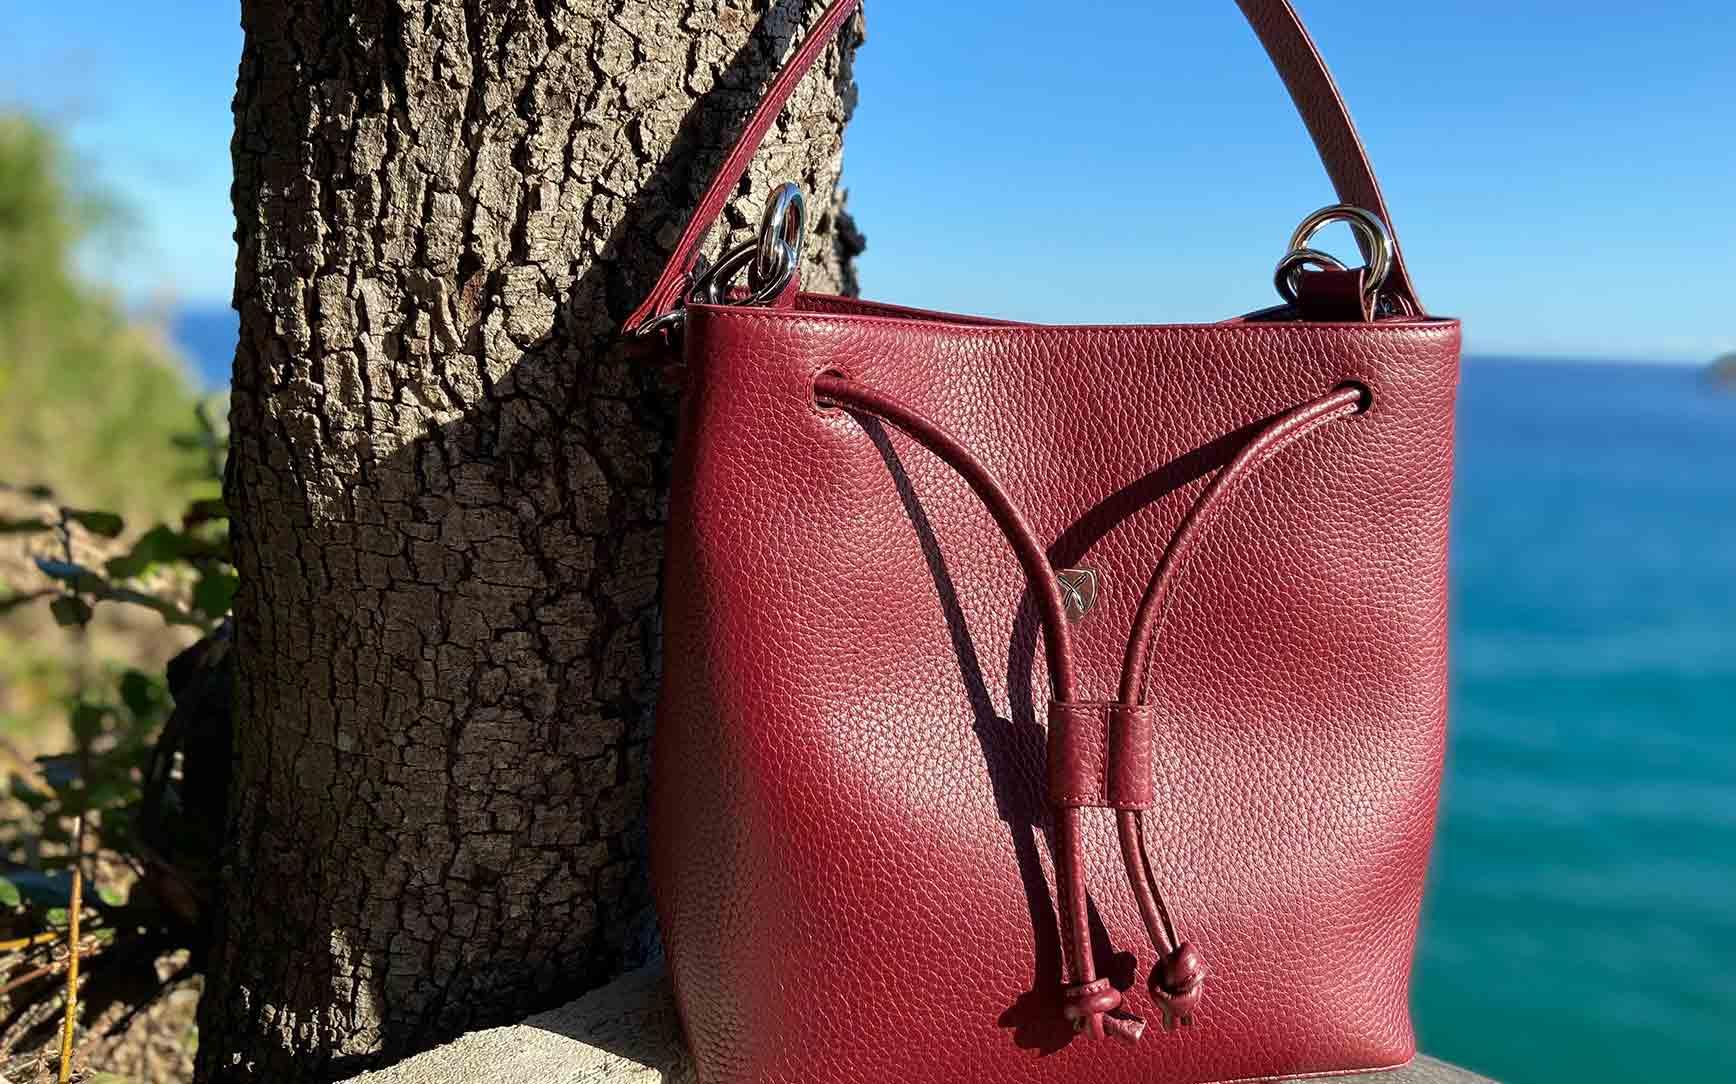 Handbag shoulderbag 10 inch leather bordeaux